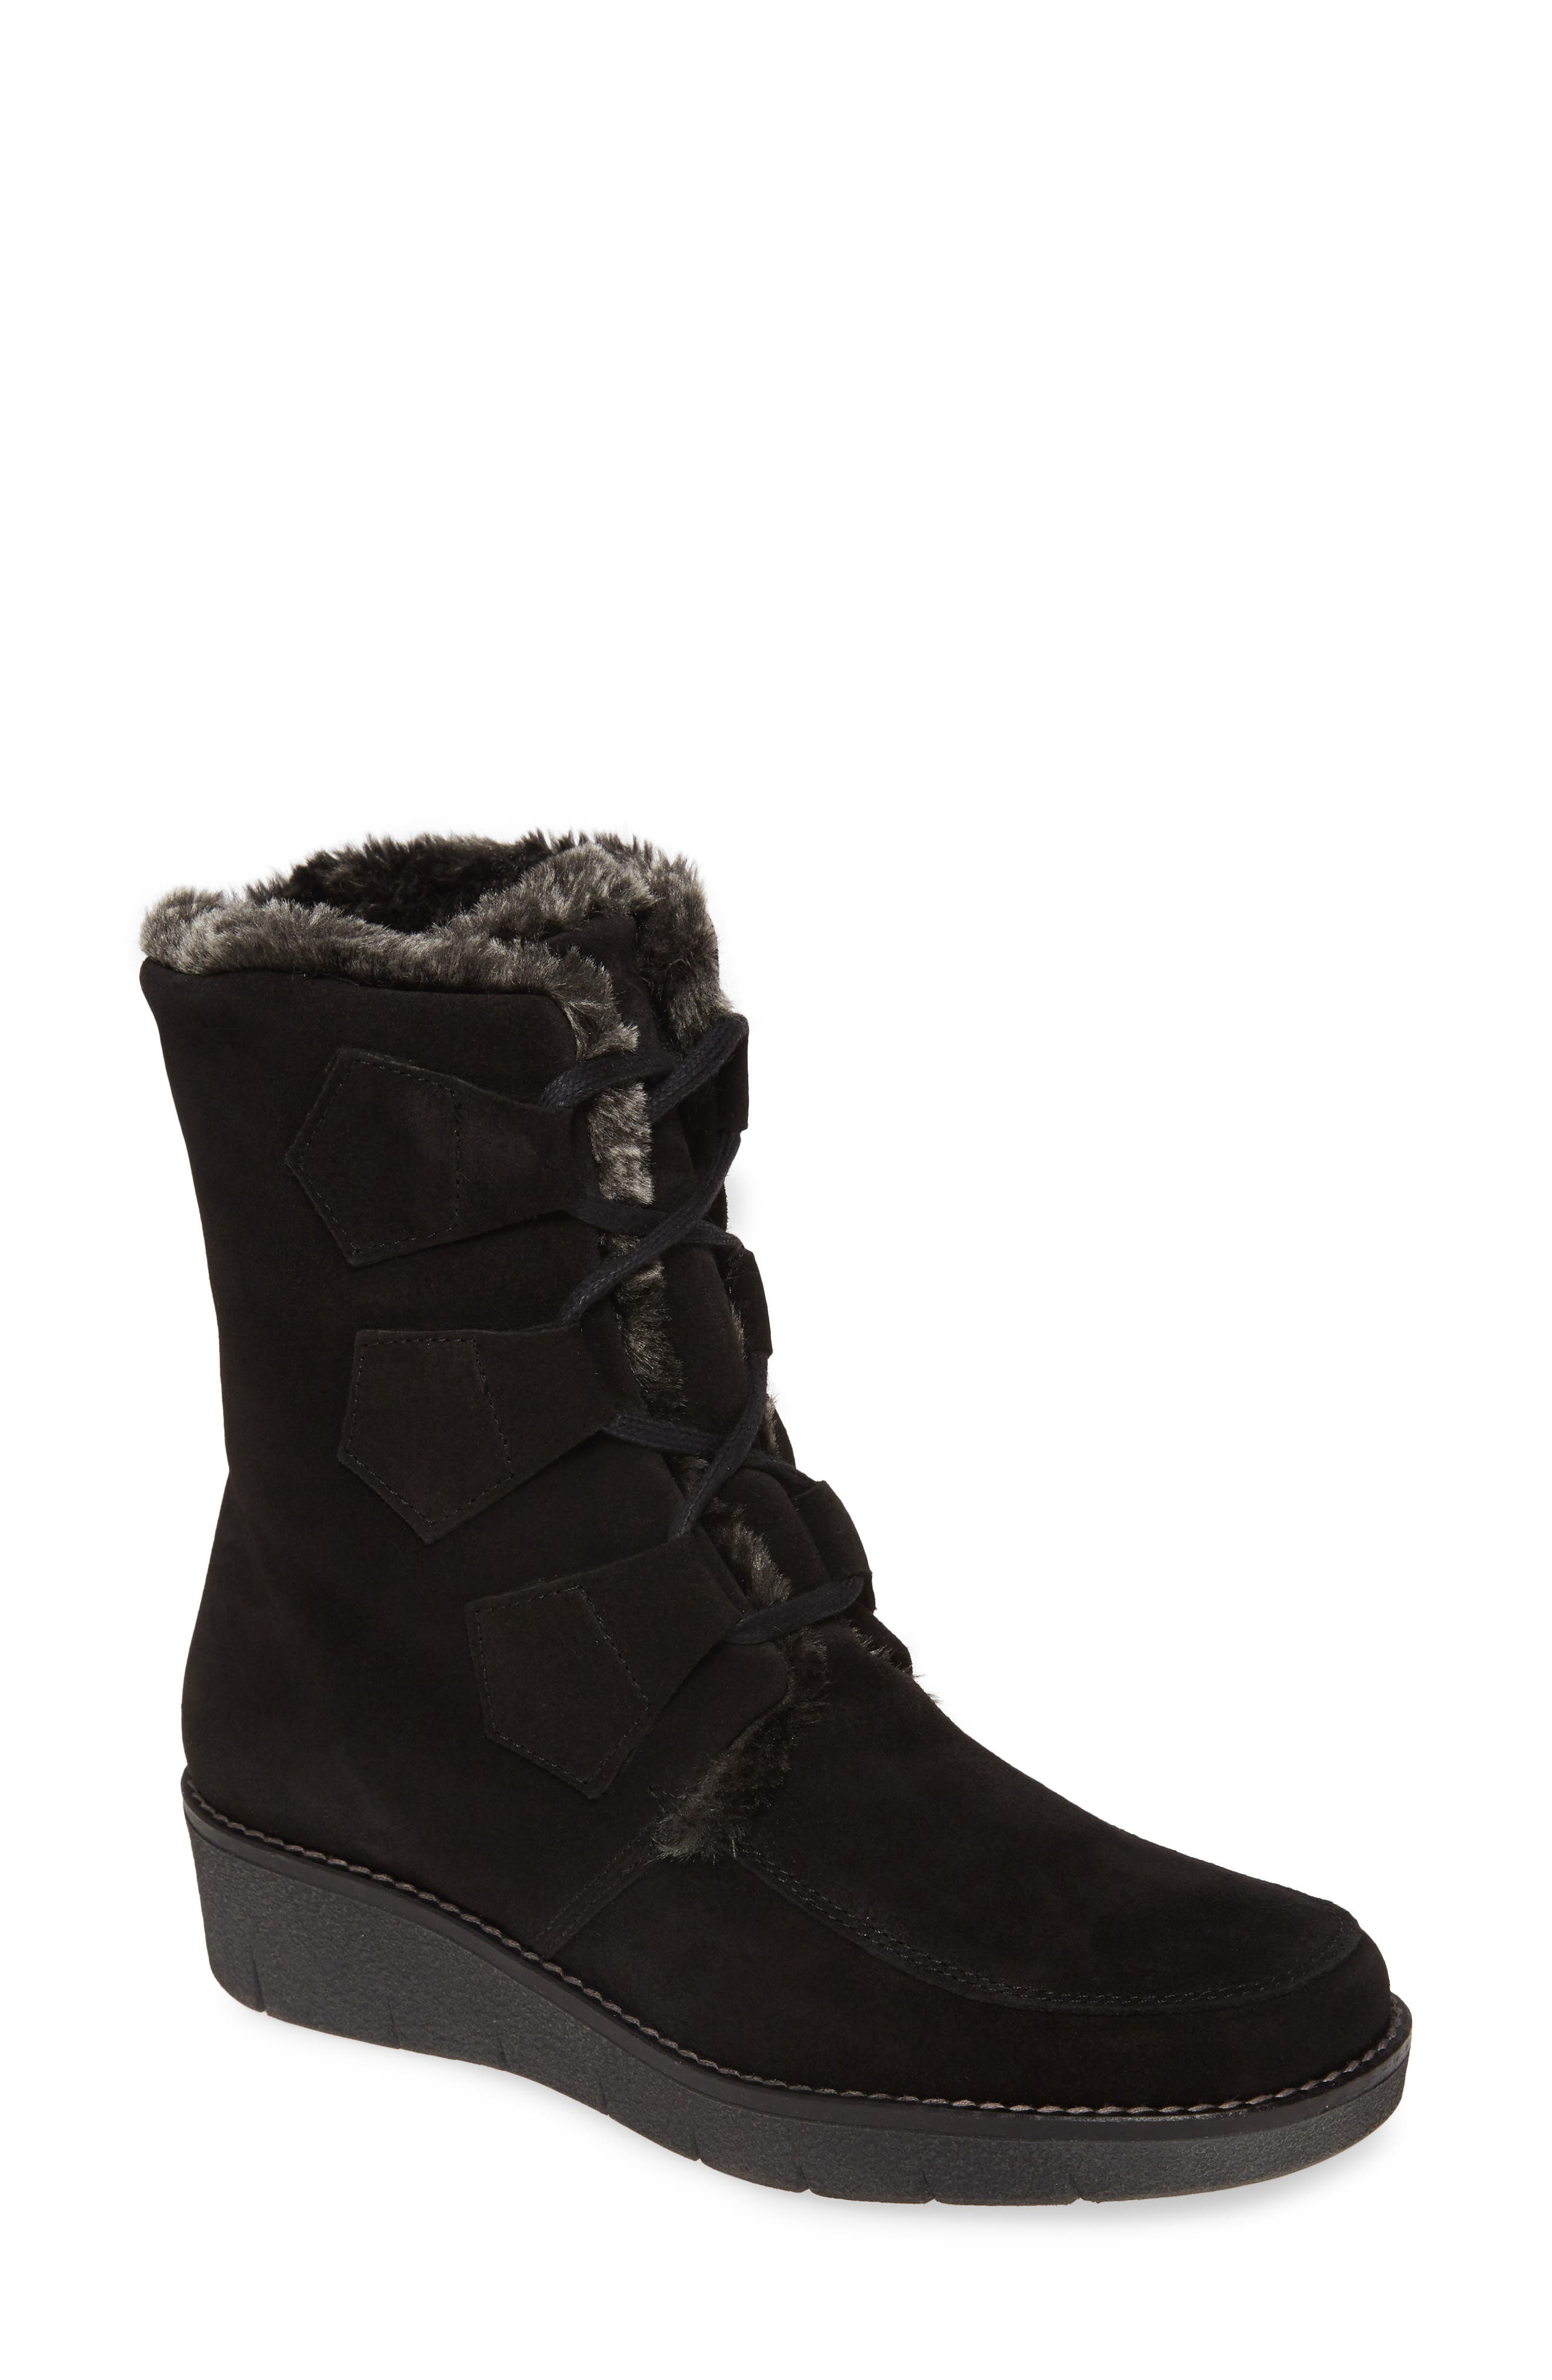 1940s Style Shoes, 40s Shoes Womens Toni Pons Ador Faux Fur Lined Bootie $143.37 AT vintagedancer.com